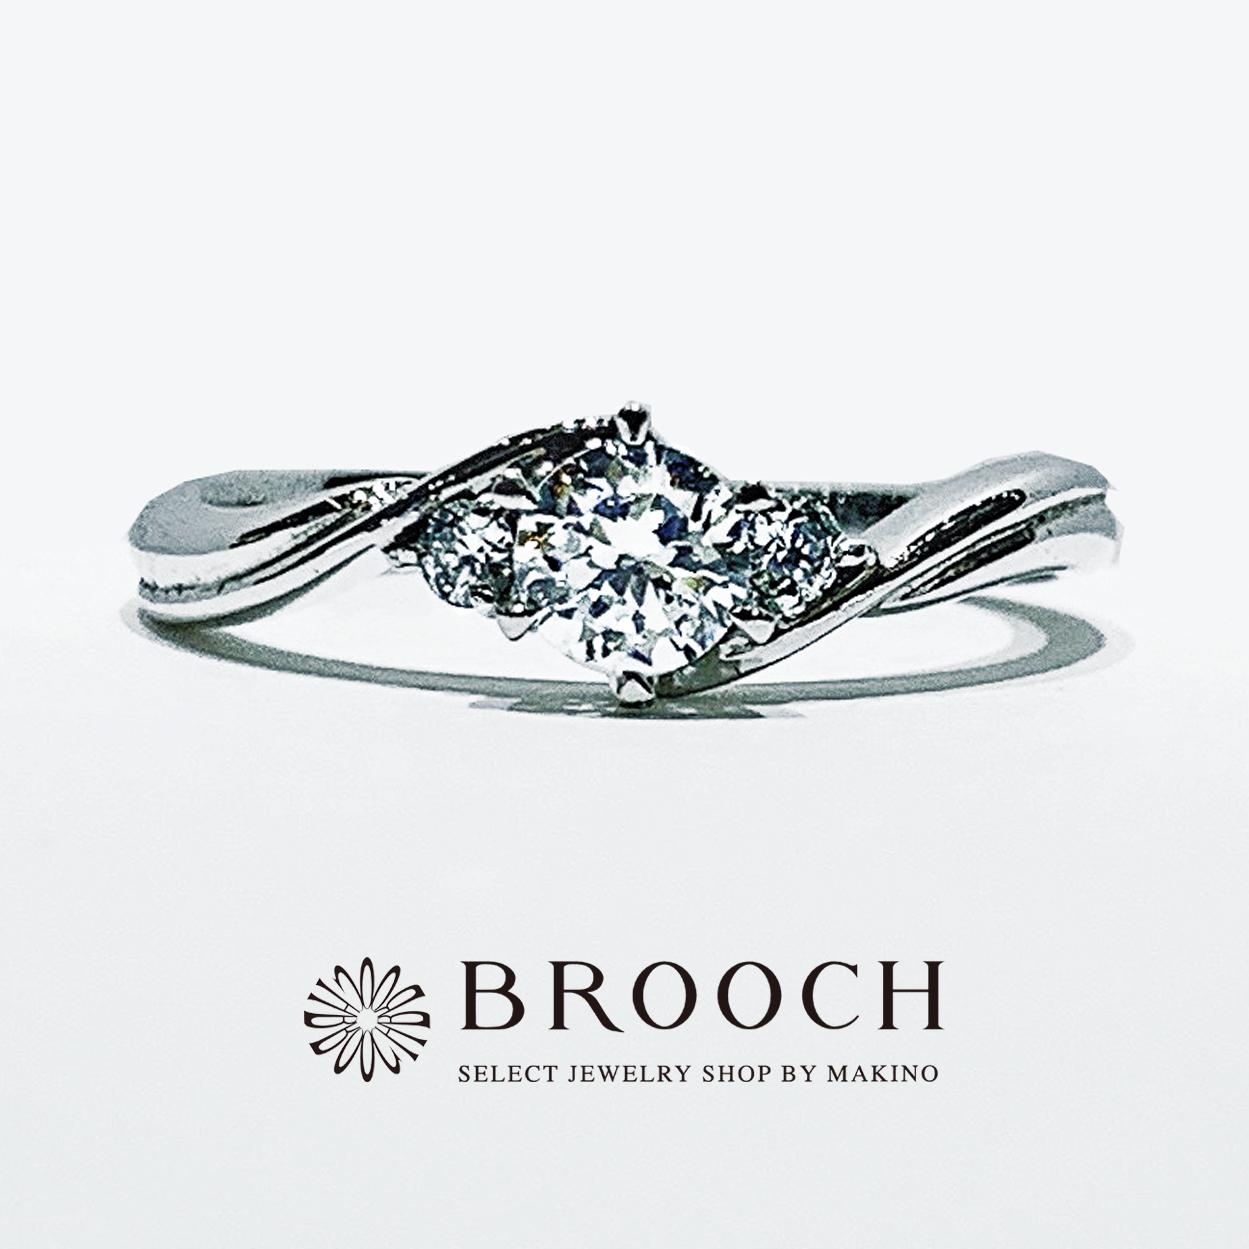 BROOCH 婚約指輪 エンゲージリング ツイストウェーブデザイン